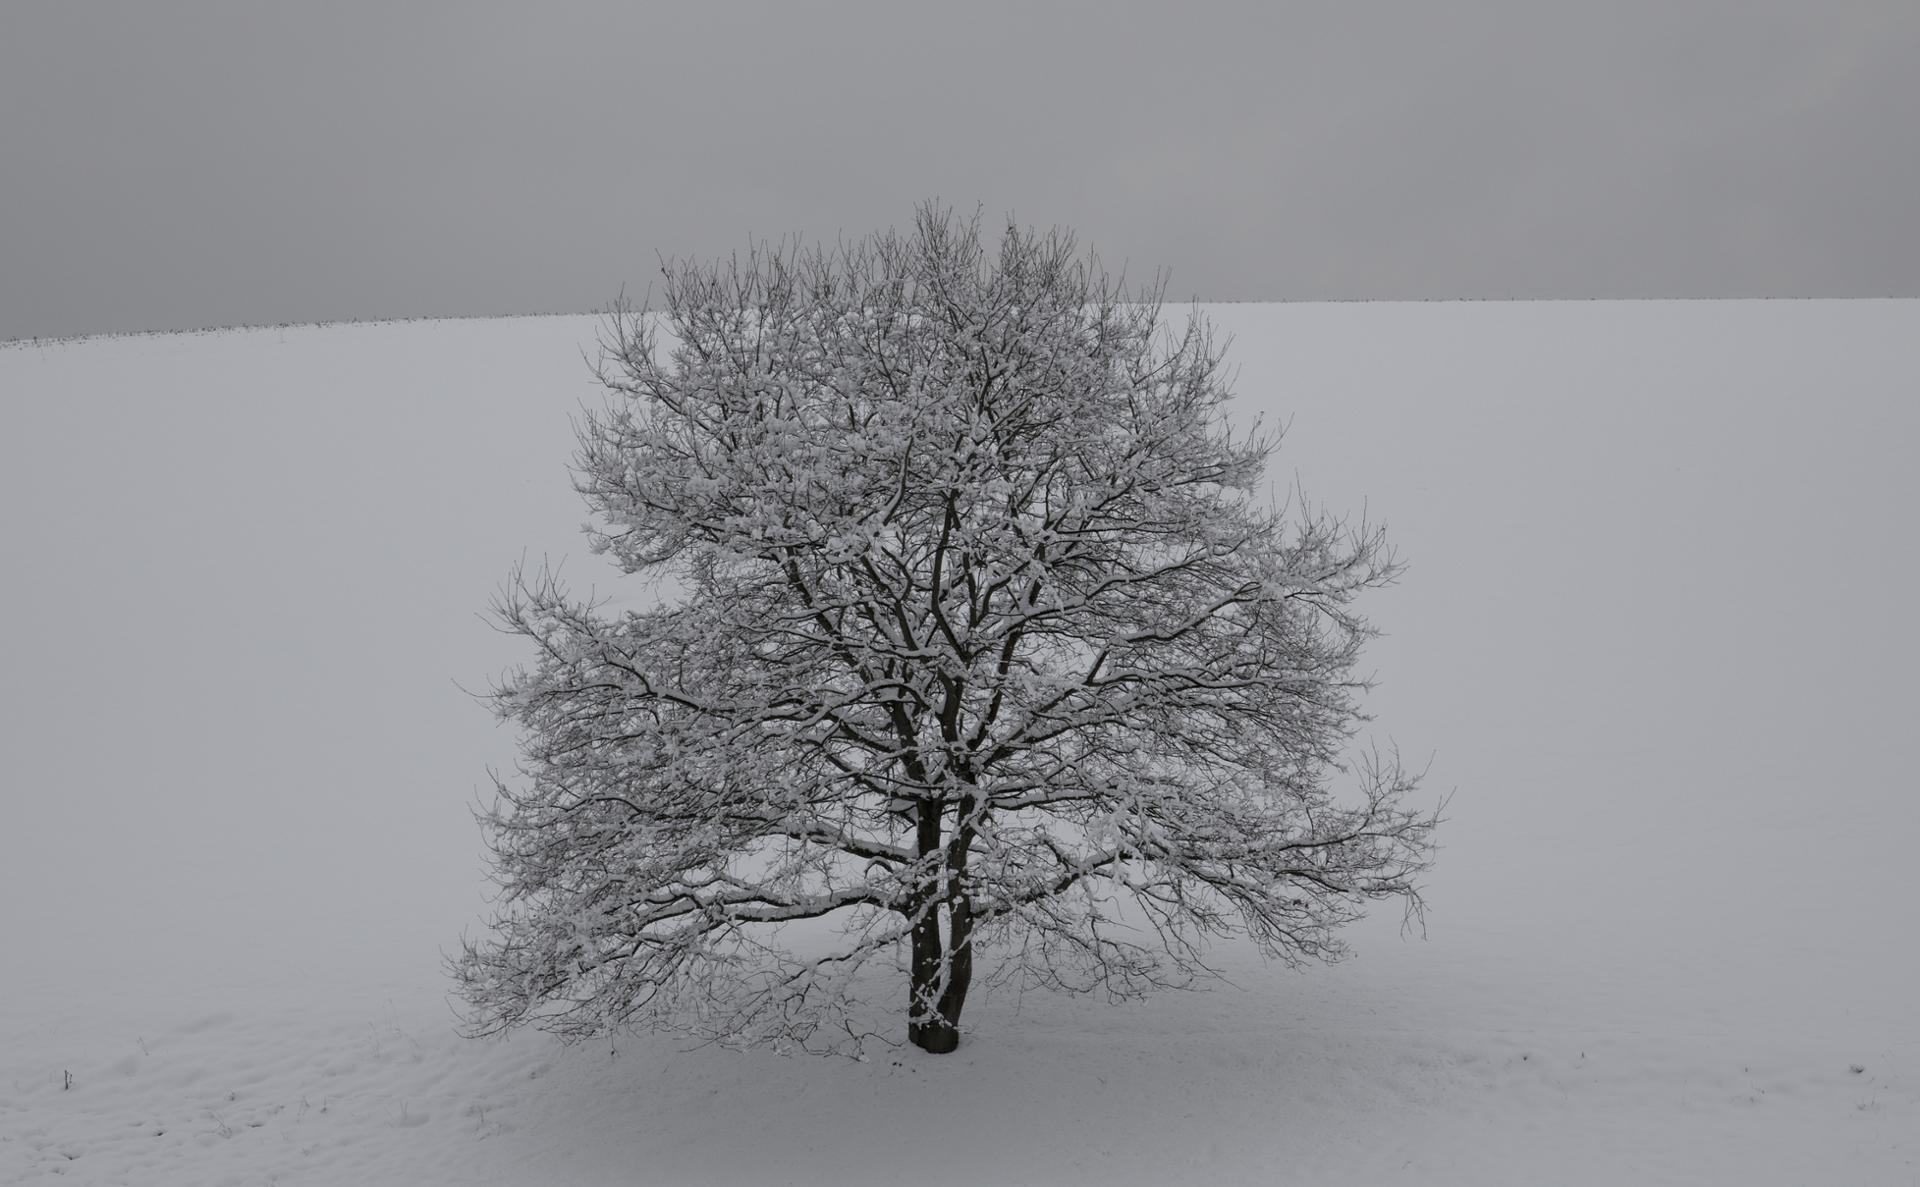 arbre solitaire.jpg